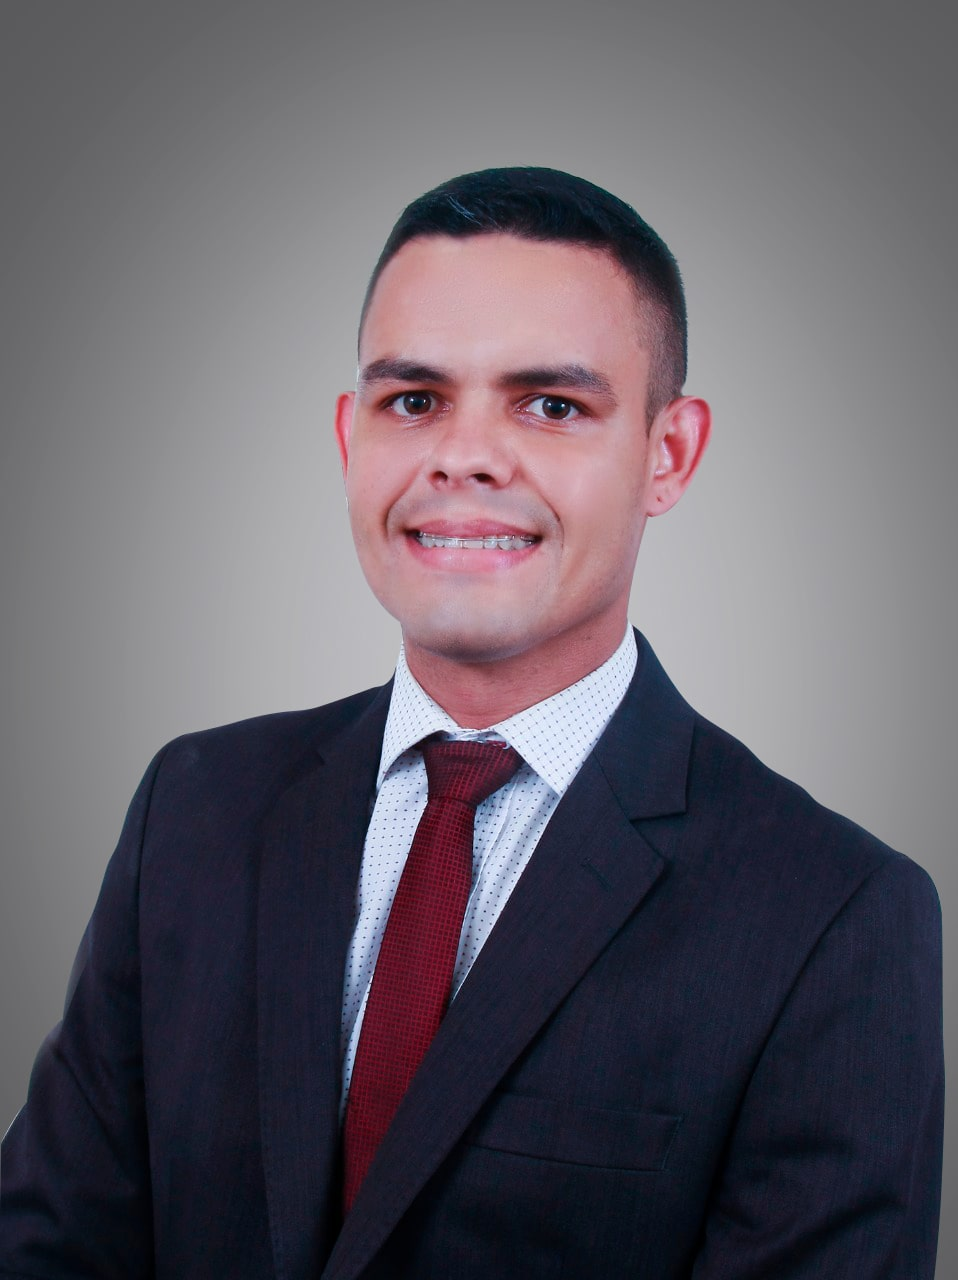 Reinaldo Severino Ribeiro